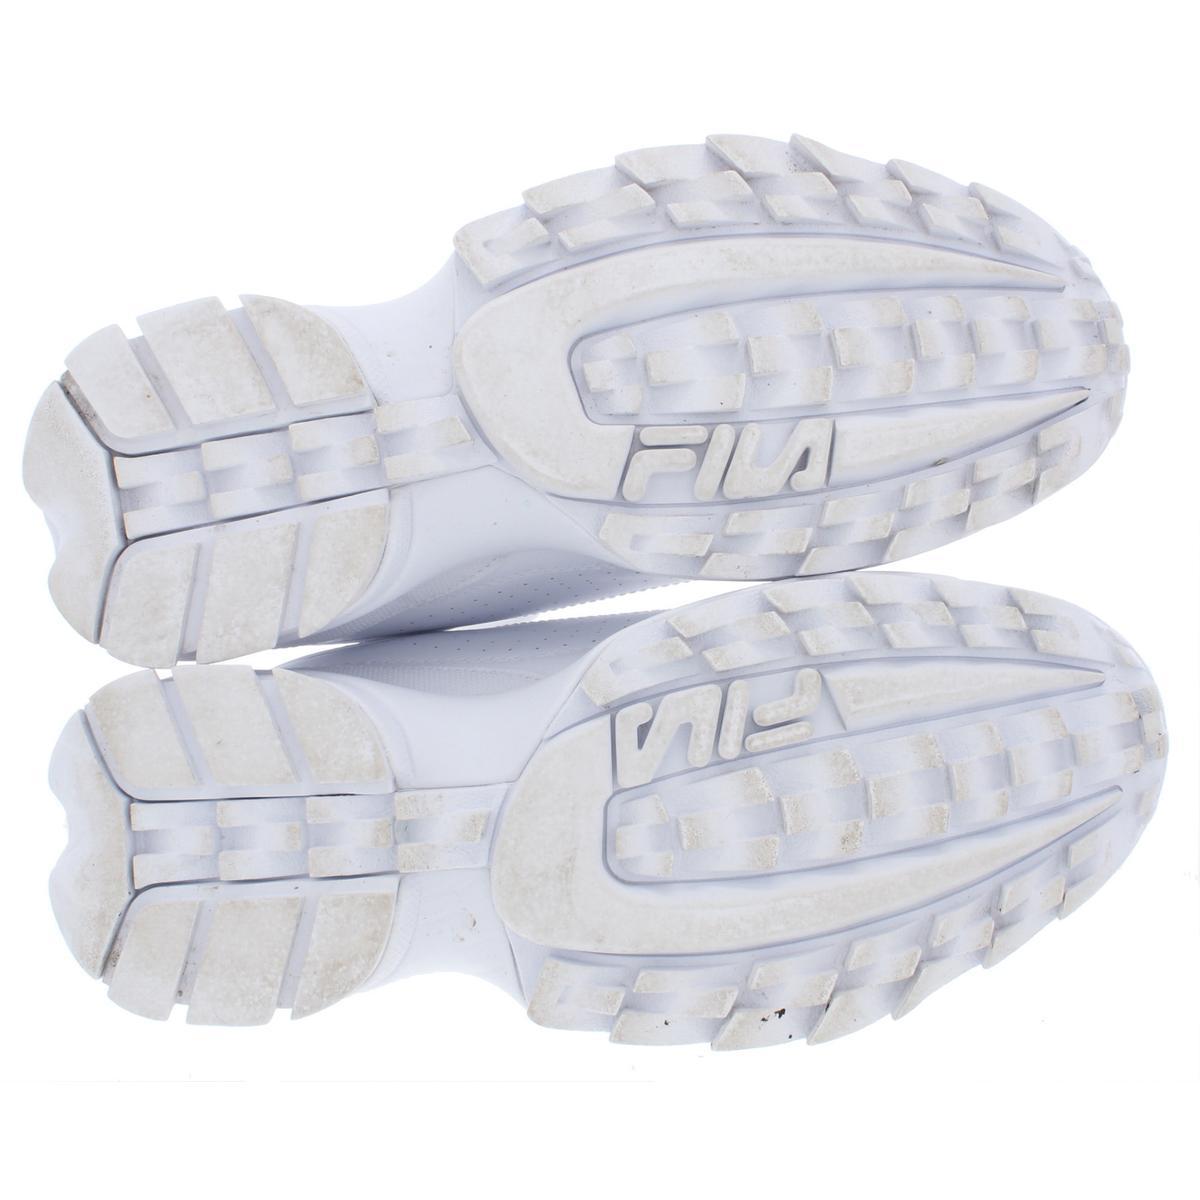 thumbnail 10 - Fila Men's Disruptor II Premium Leather EVA Retro Chunky Athletic Sneakers